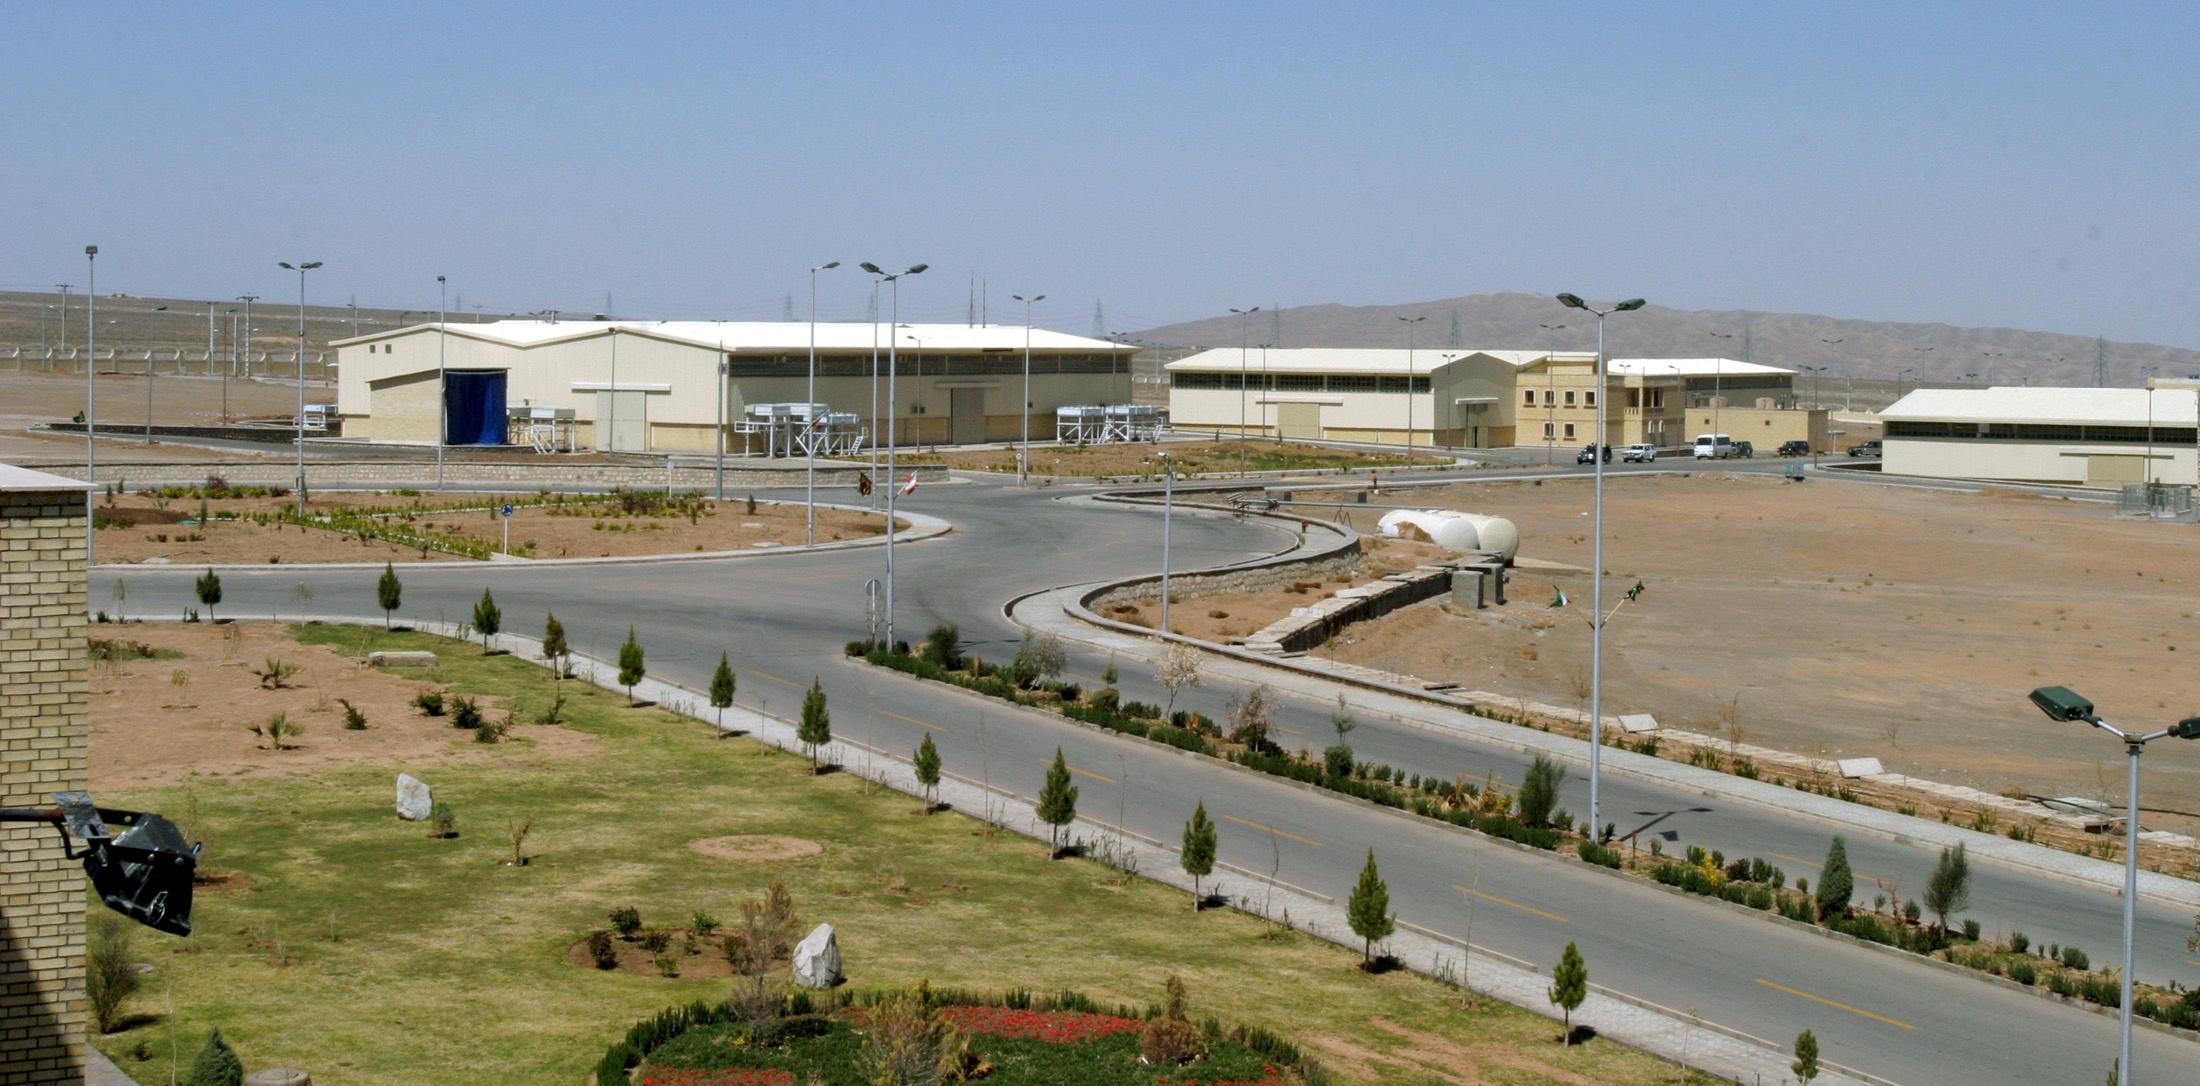 A view of the Natanz uranium enrichment facility 250 km (155 miles) south of the Iranian capital Tehran, March 30, 2005. REUTERS/Raheb Homavandi/File Photo